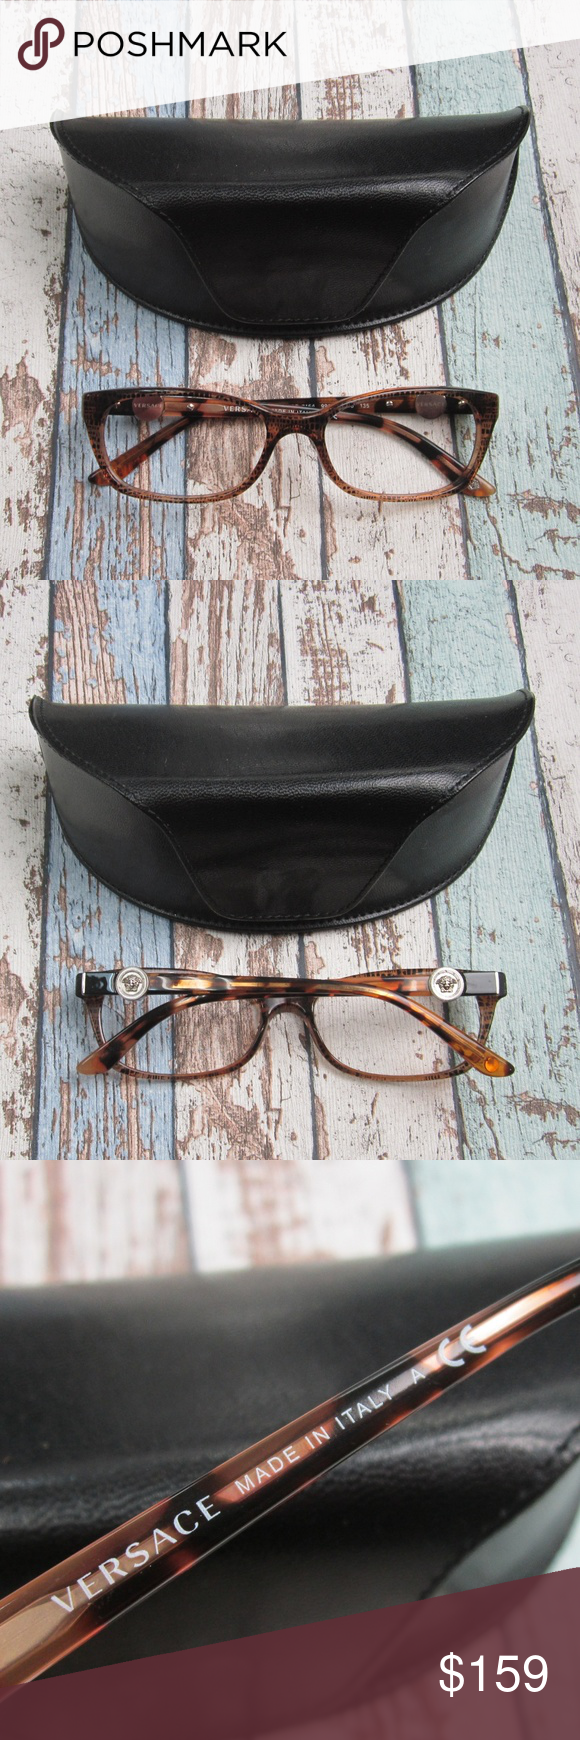 7fcd8a4f375e Versace MOD 3164 991 Eyeglasses /Italy/OLP257 Made in: Italy Versace Medusa  Lens